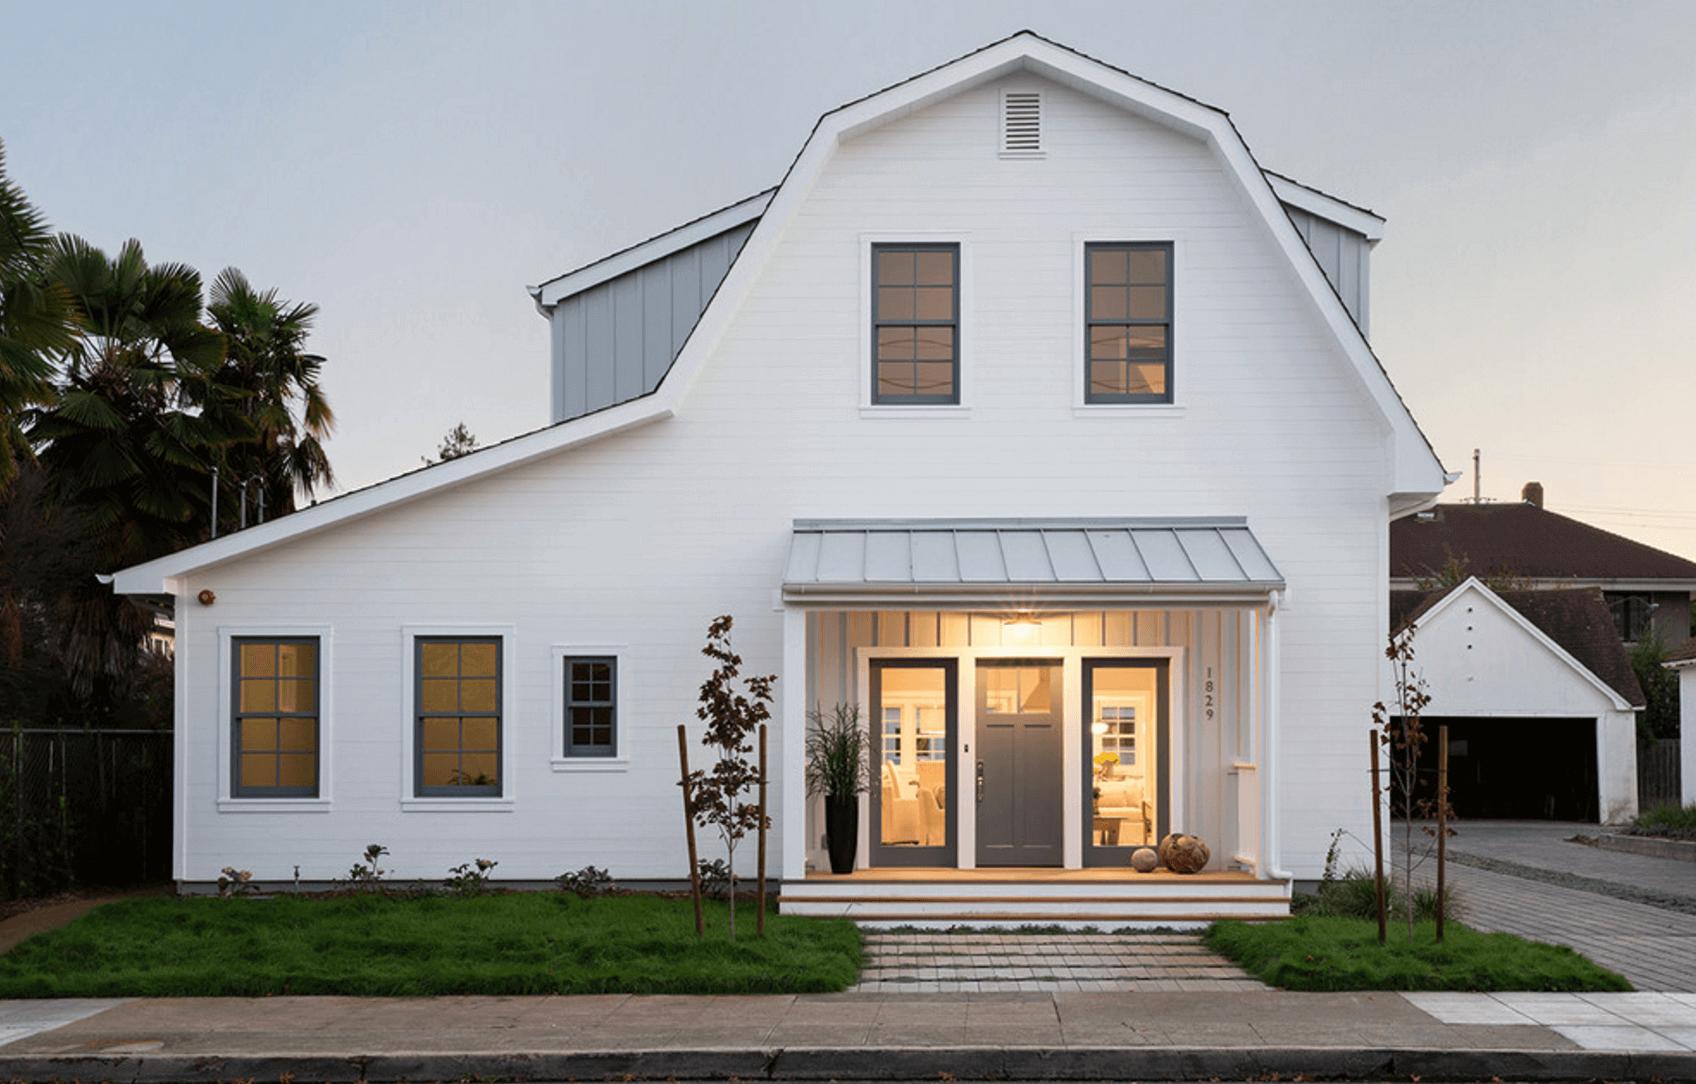 Best Of Scandinavian Exterior Designs Of The House White Exterior Houses Modern Farmhouse Exterior House Exterior